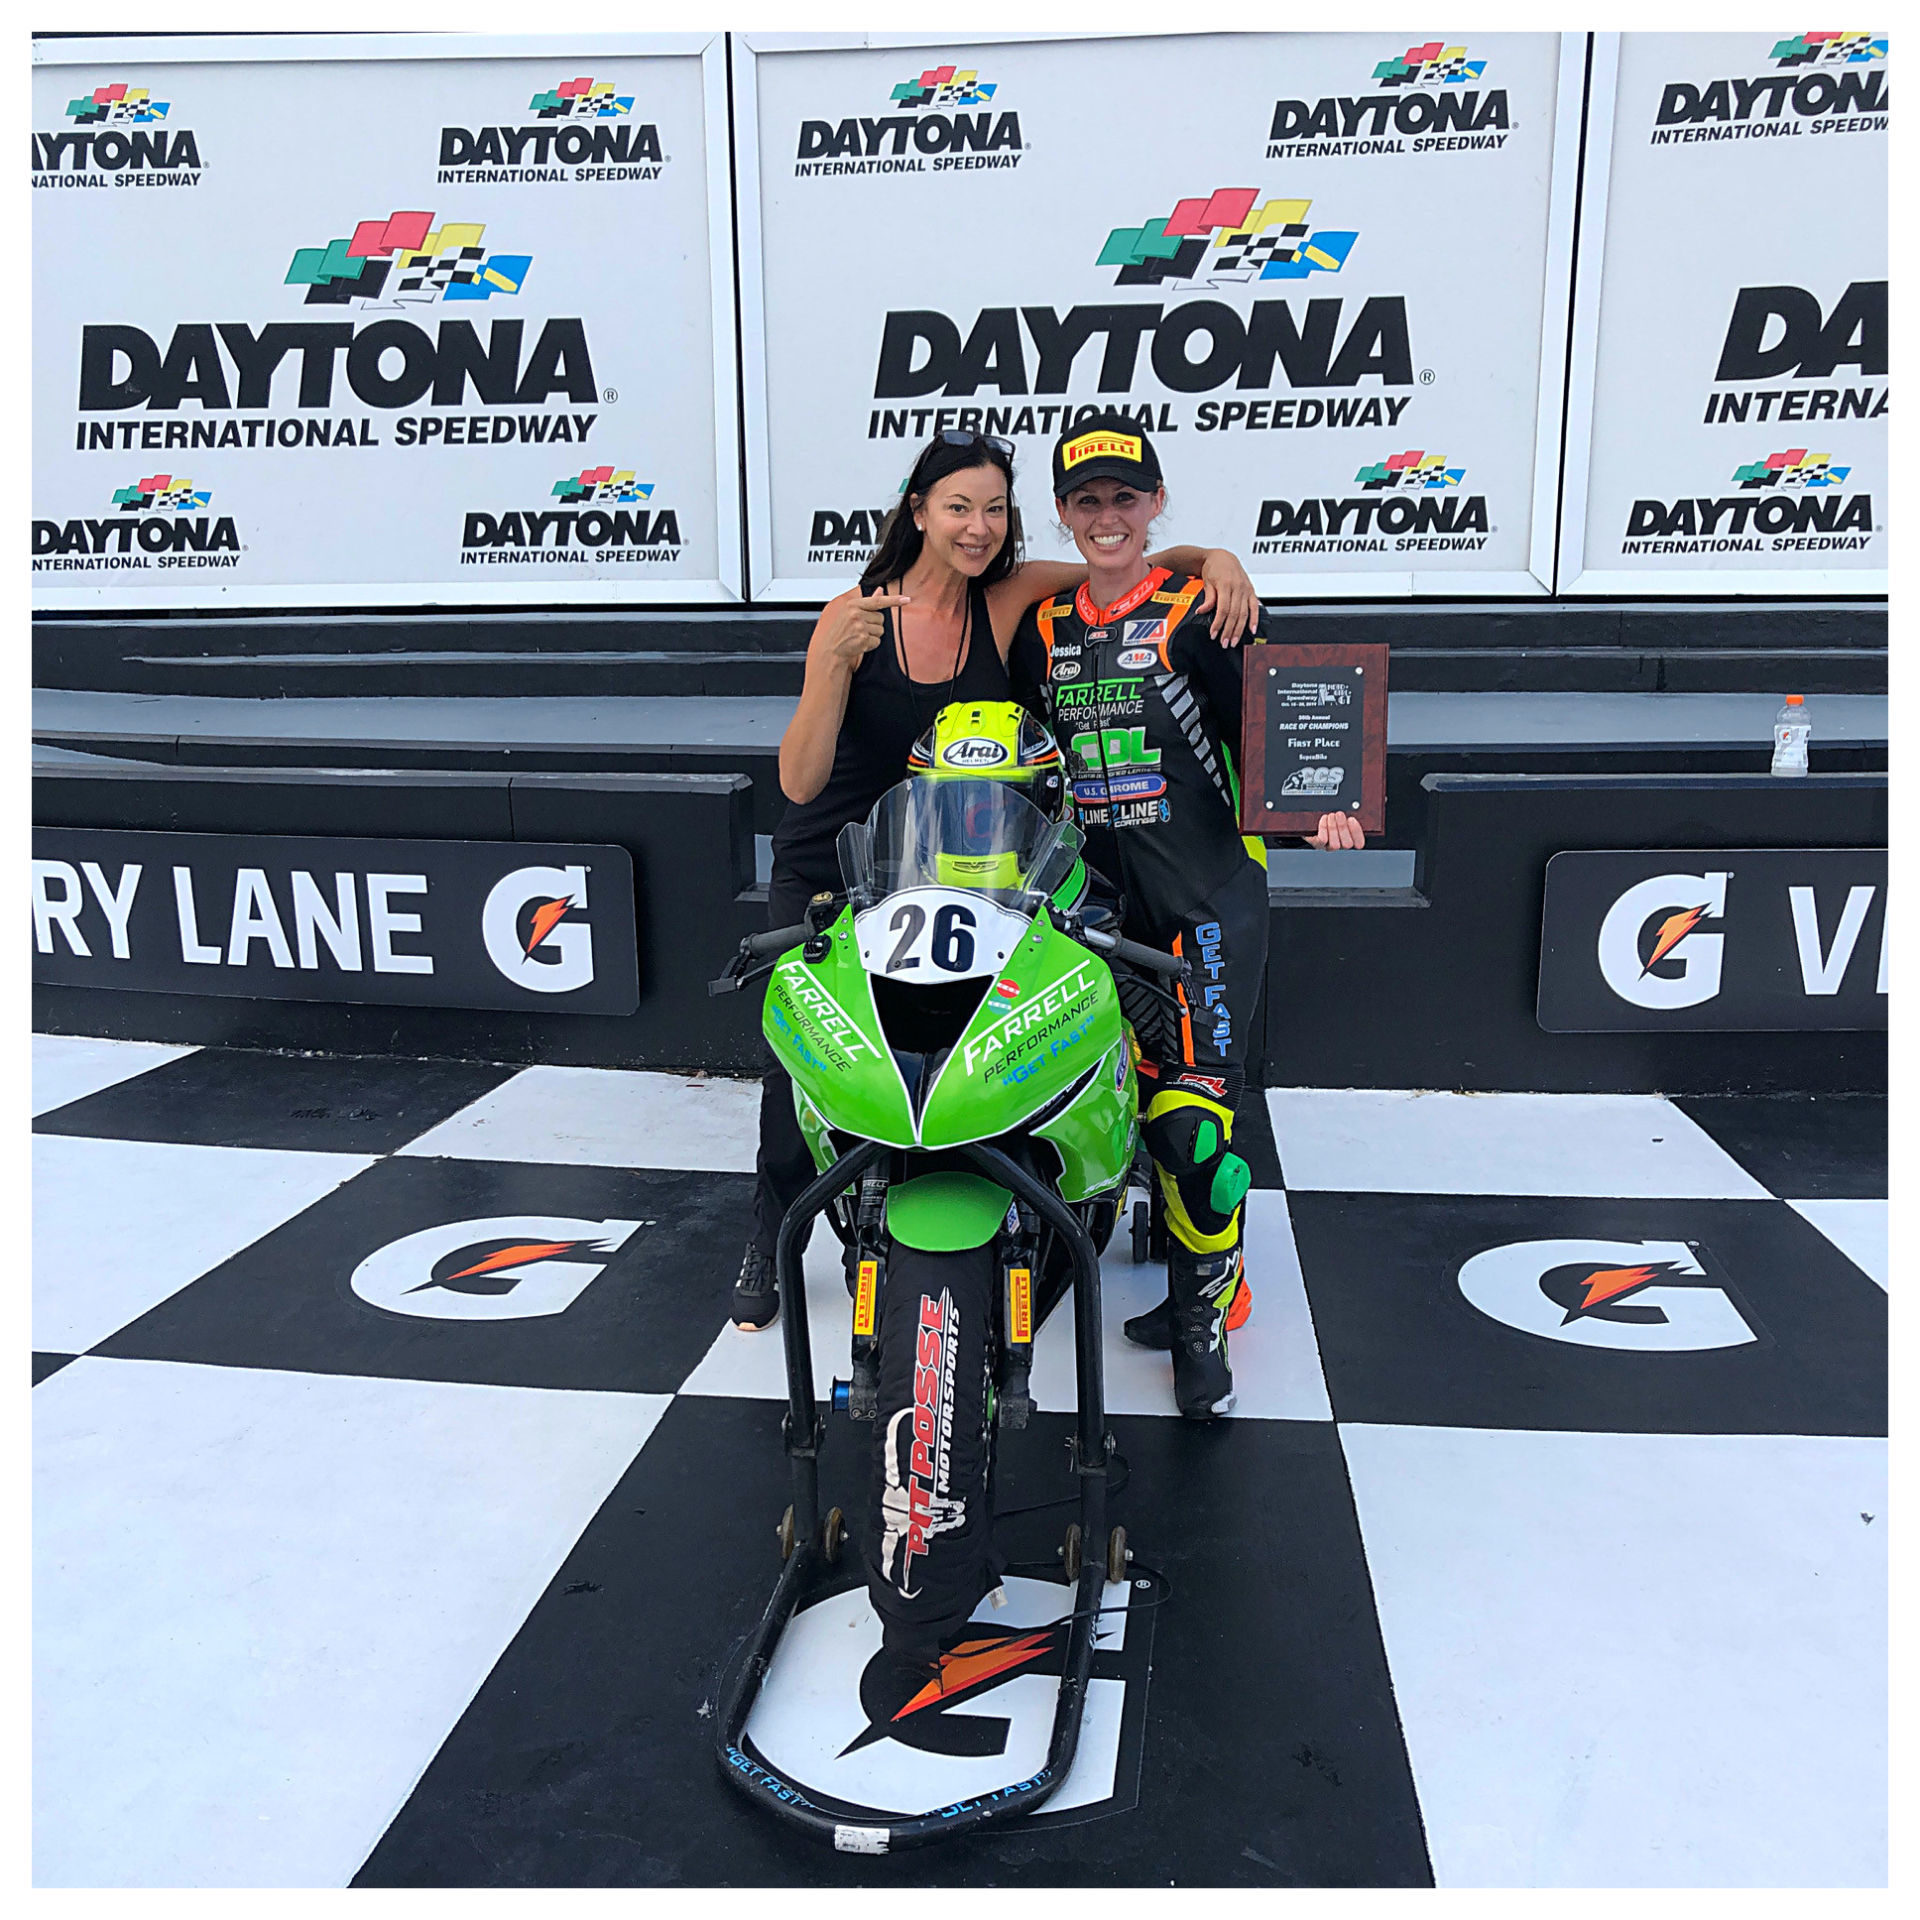 Angela Izzo-Sink, Operating Director of MotoGirlGT Roadracing Championship Series (left), and MotoGirlGT Superbike race winner Jessica Capizzi (right) in Victory Lane at Daytona International Speedway. Photo courtesy of Angela Izzo-Sink.